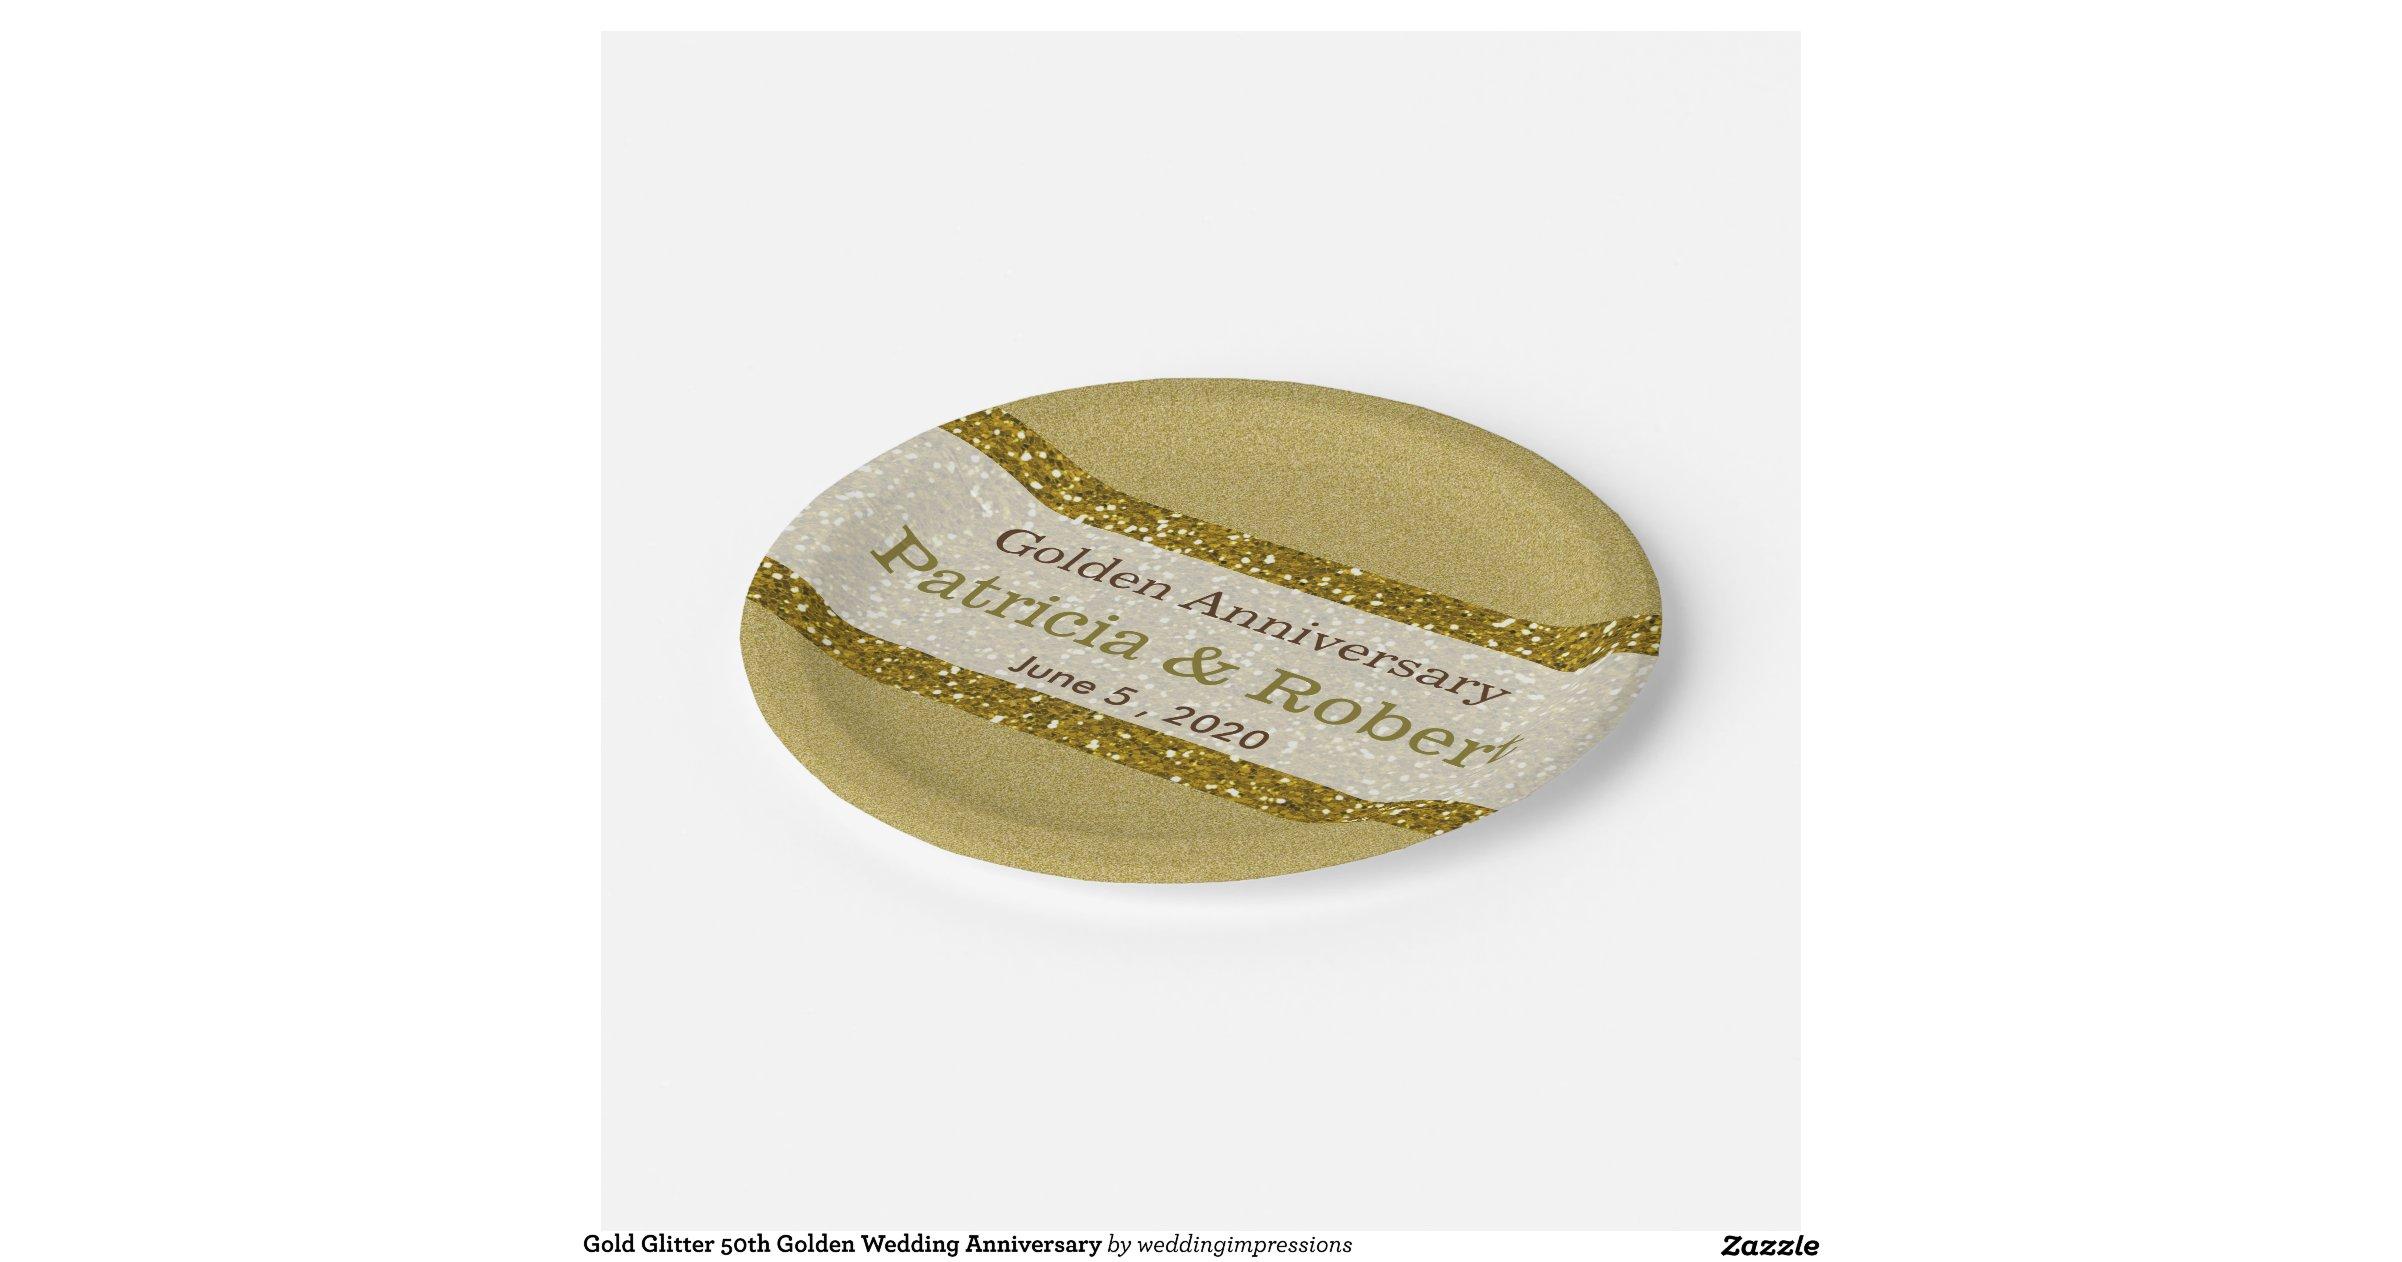 Gold Glitter 50th Golden Wedding Anniversary 7 Inch Paper Plate Zazzle